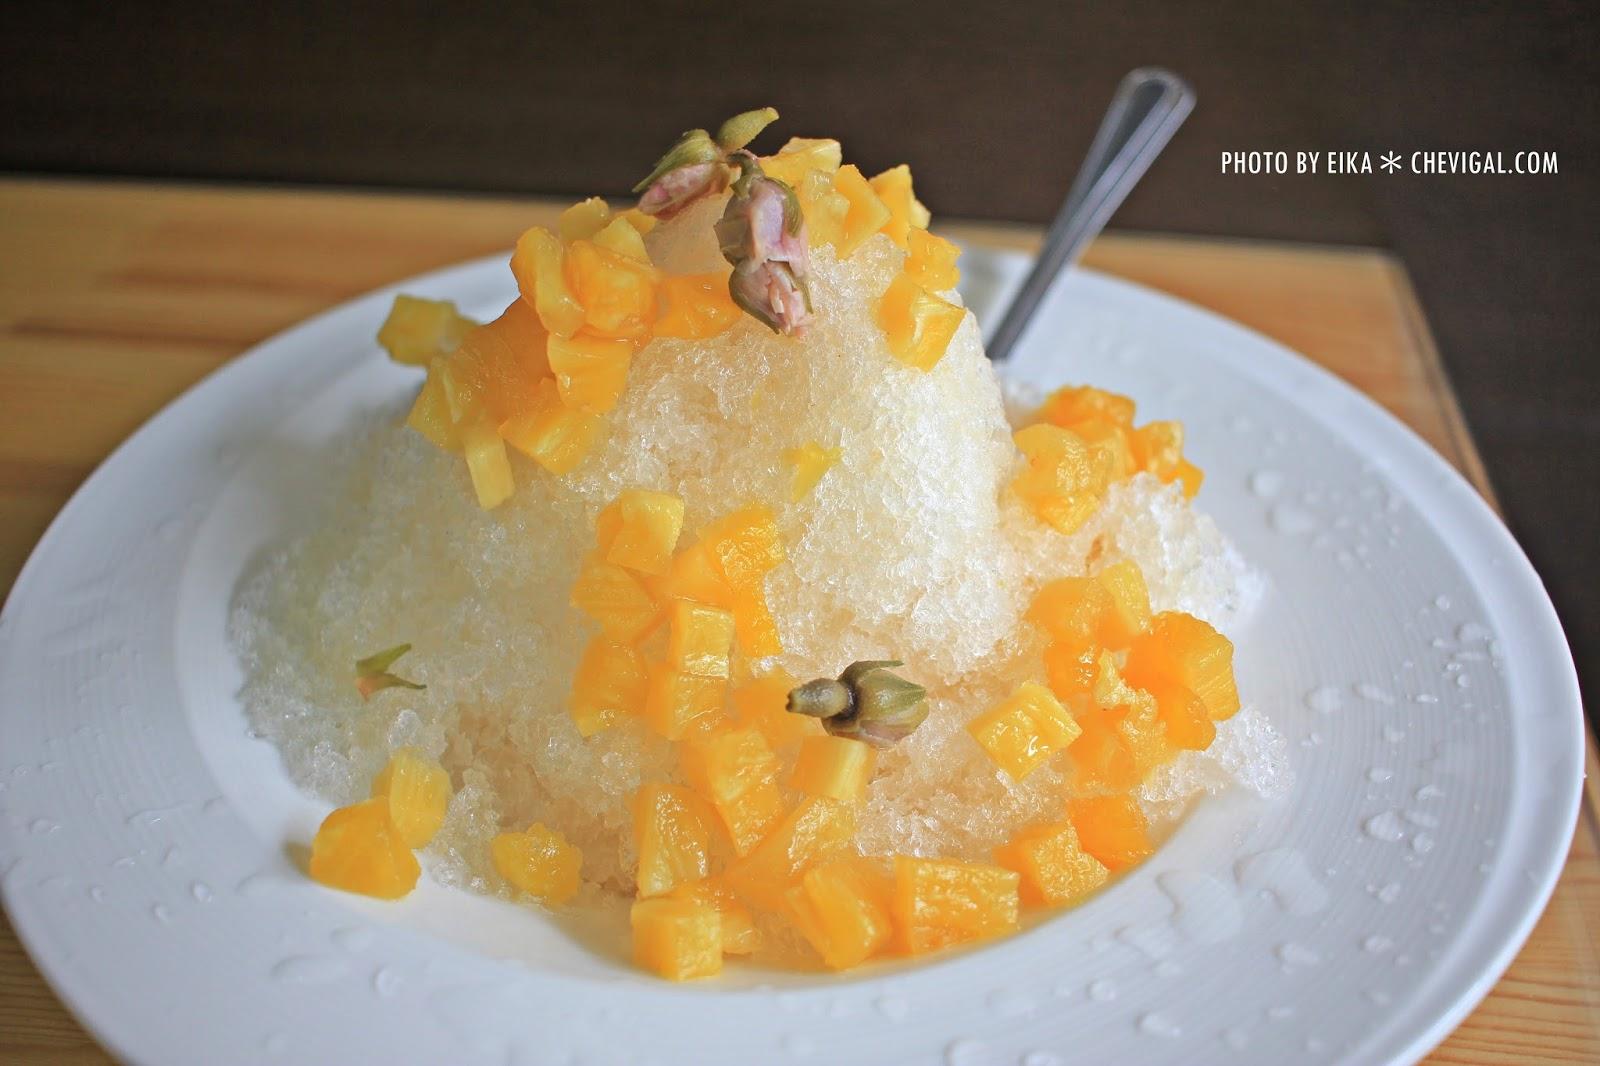 IMG 0145 - 台中烏日│蔡冰甜品。雪山上的愛情最純粹。全台獨有的鳳梨玫瑰冰。等你來感受芬芳原味